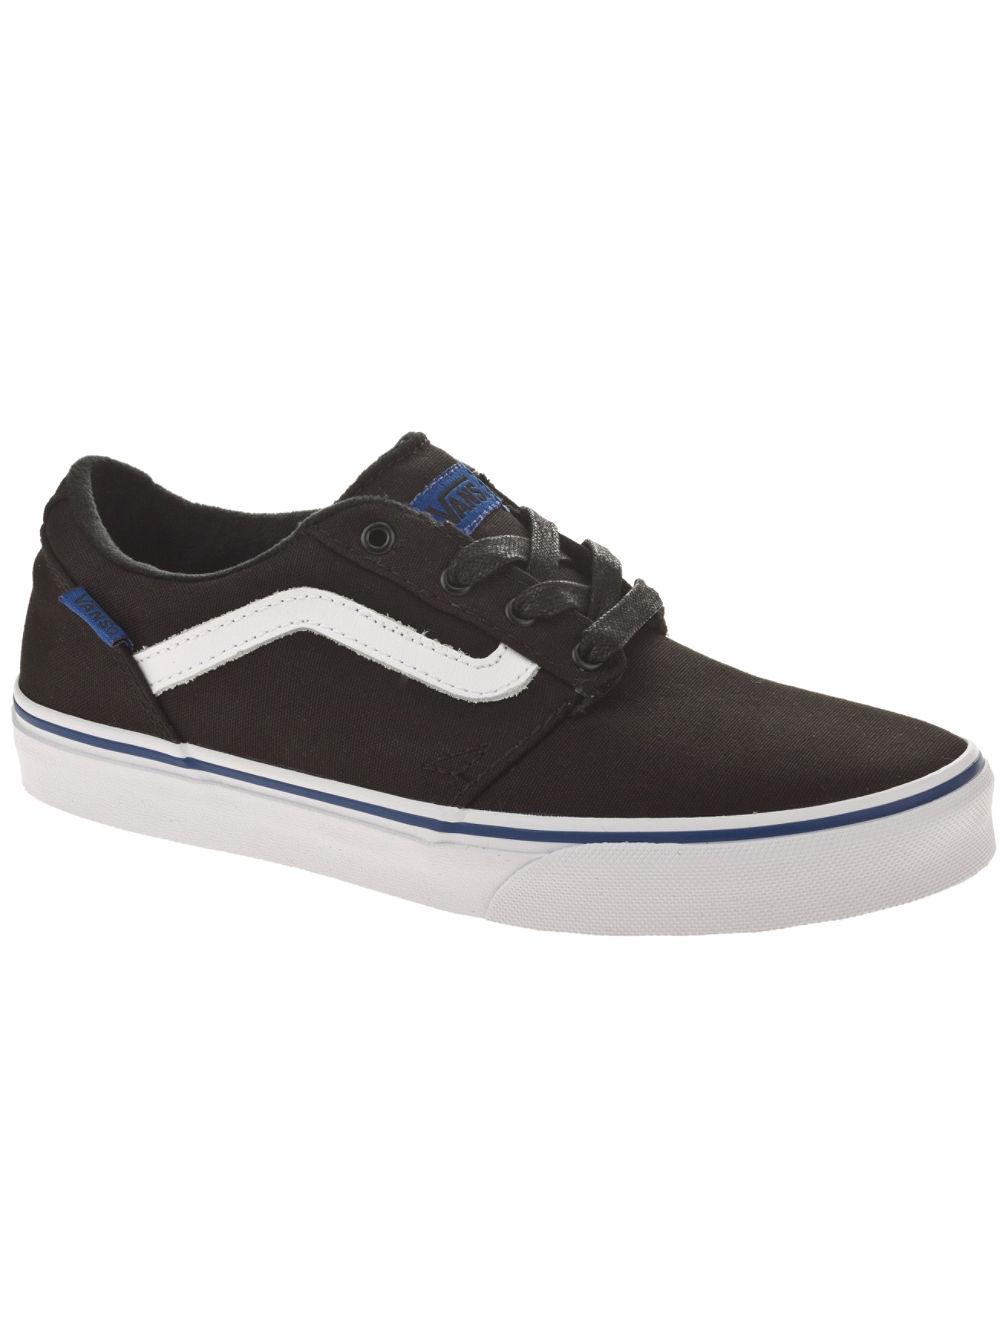 4c14e5f186 Buy Vans Chapman Stripe Sneakers Boys online at Blue Tomato